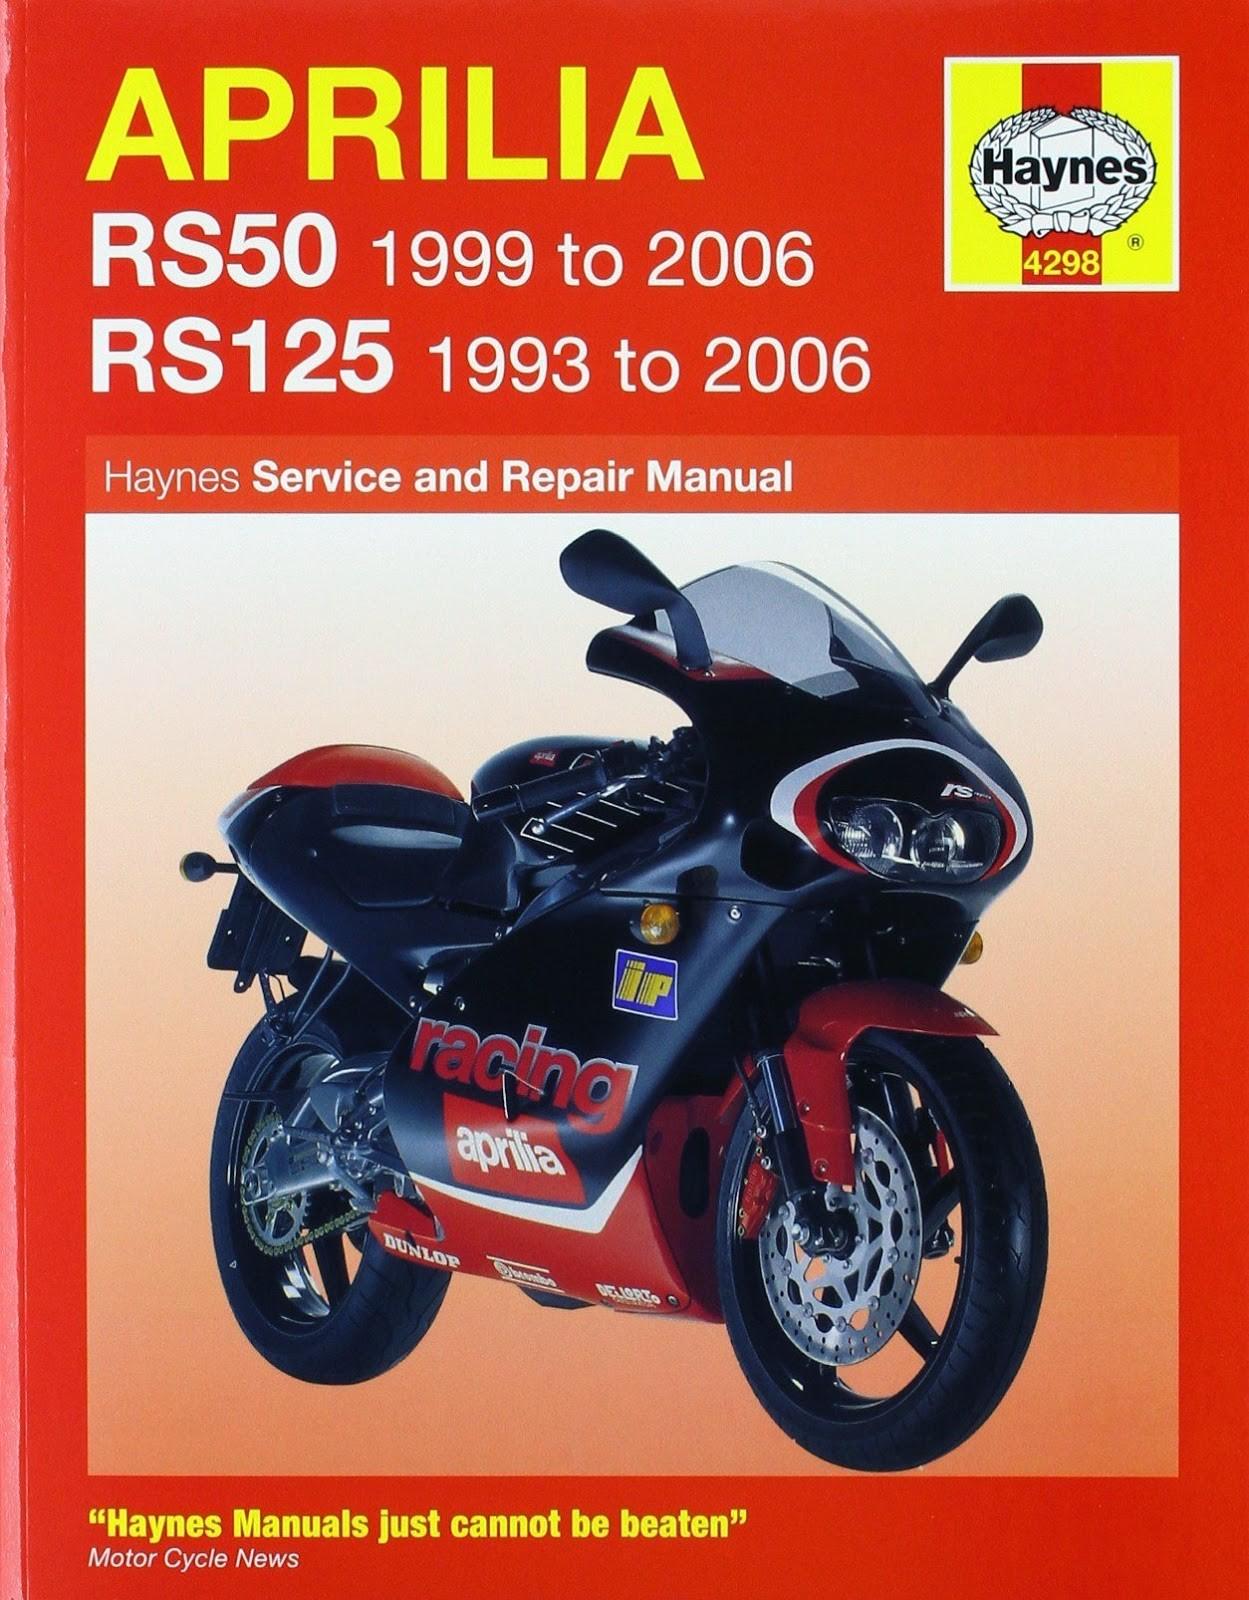 Aprilia Rs 125 Engine Diagram Aprilia Rs 125 Aprilia Rs 125 Problems Troubleshooting Fault Of Aprilia Rs 125 Engine Diagram